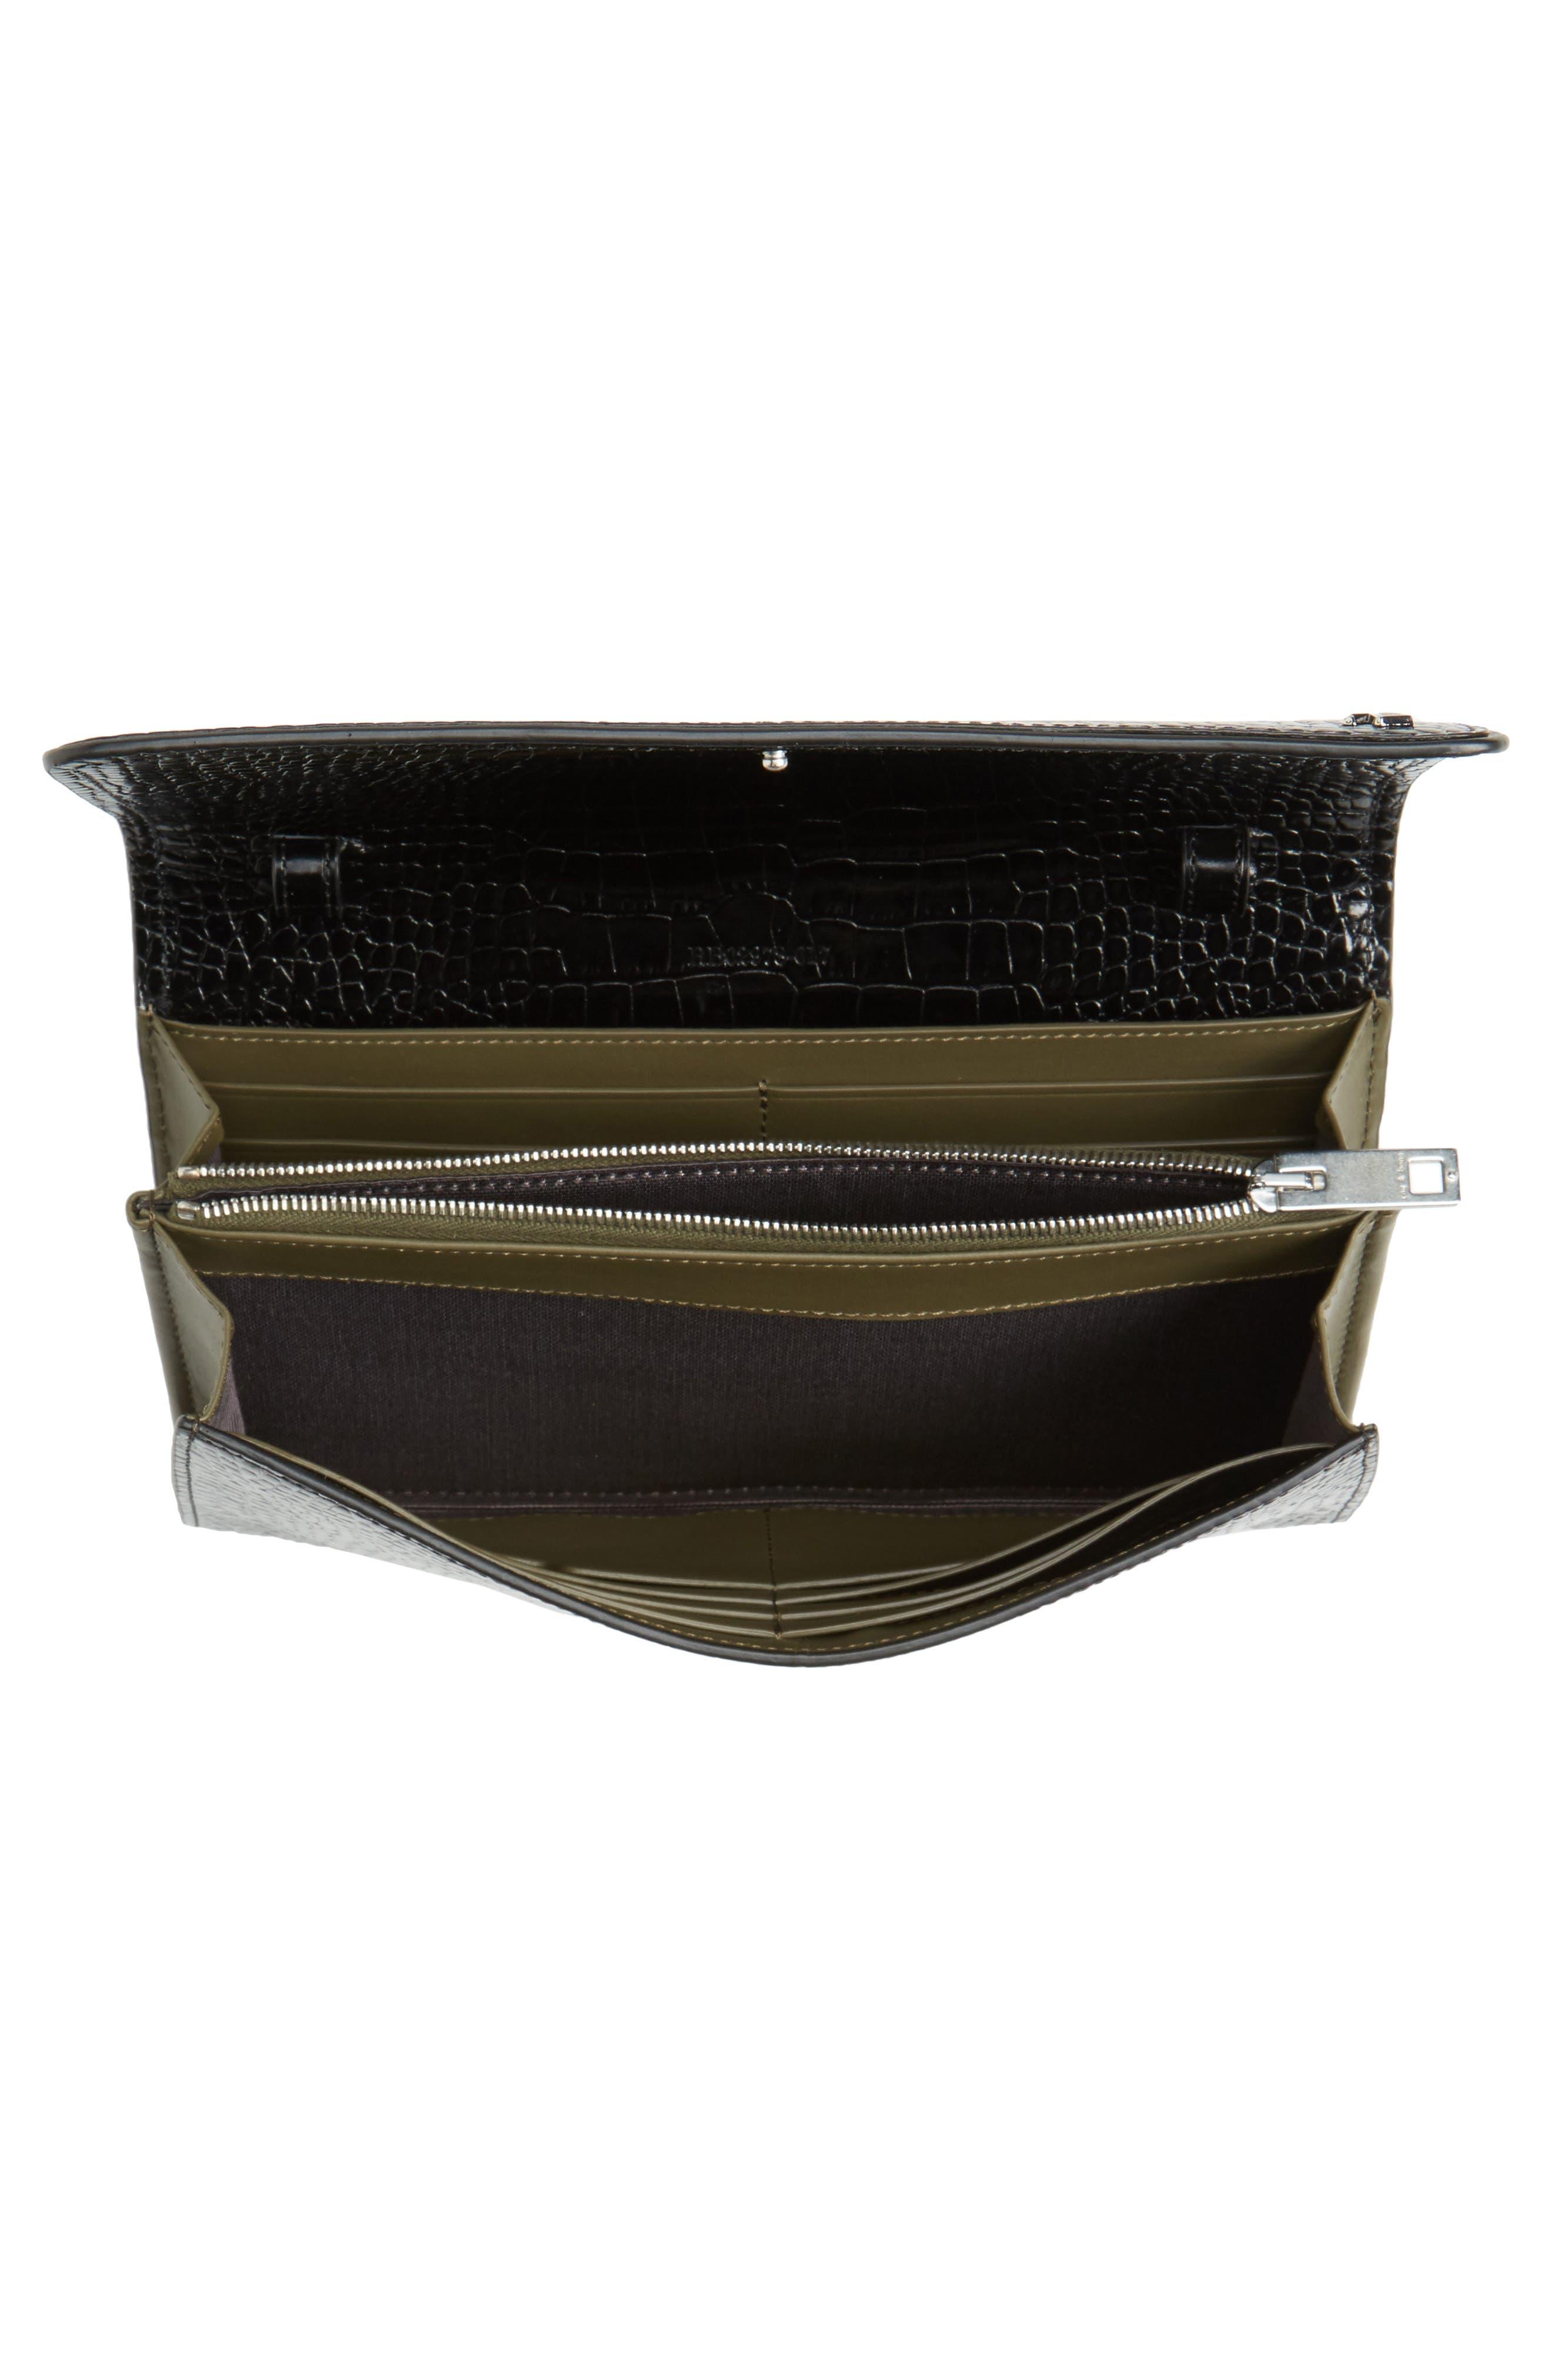 Croc-Embossed Leather Crossbody Wallet,                             Alternate thumbnail 4, color,                             Black Croco